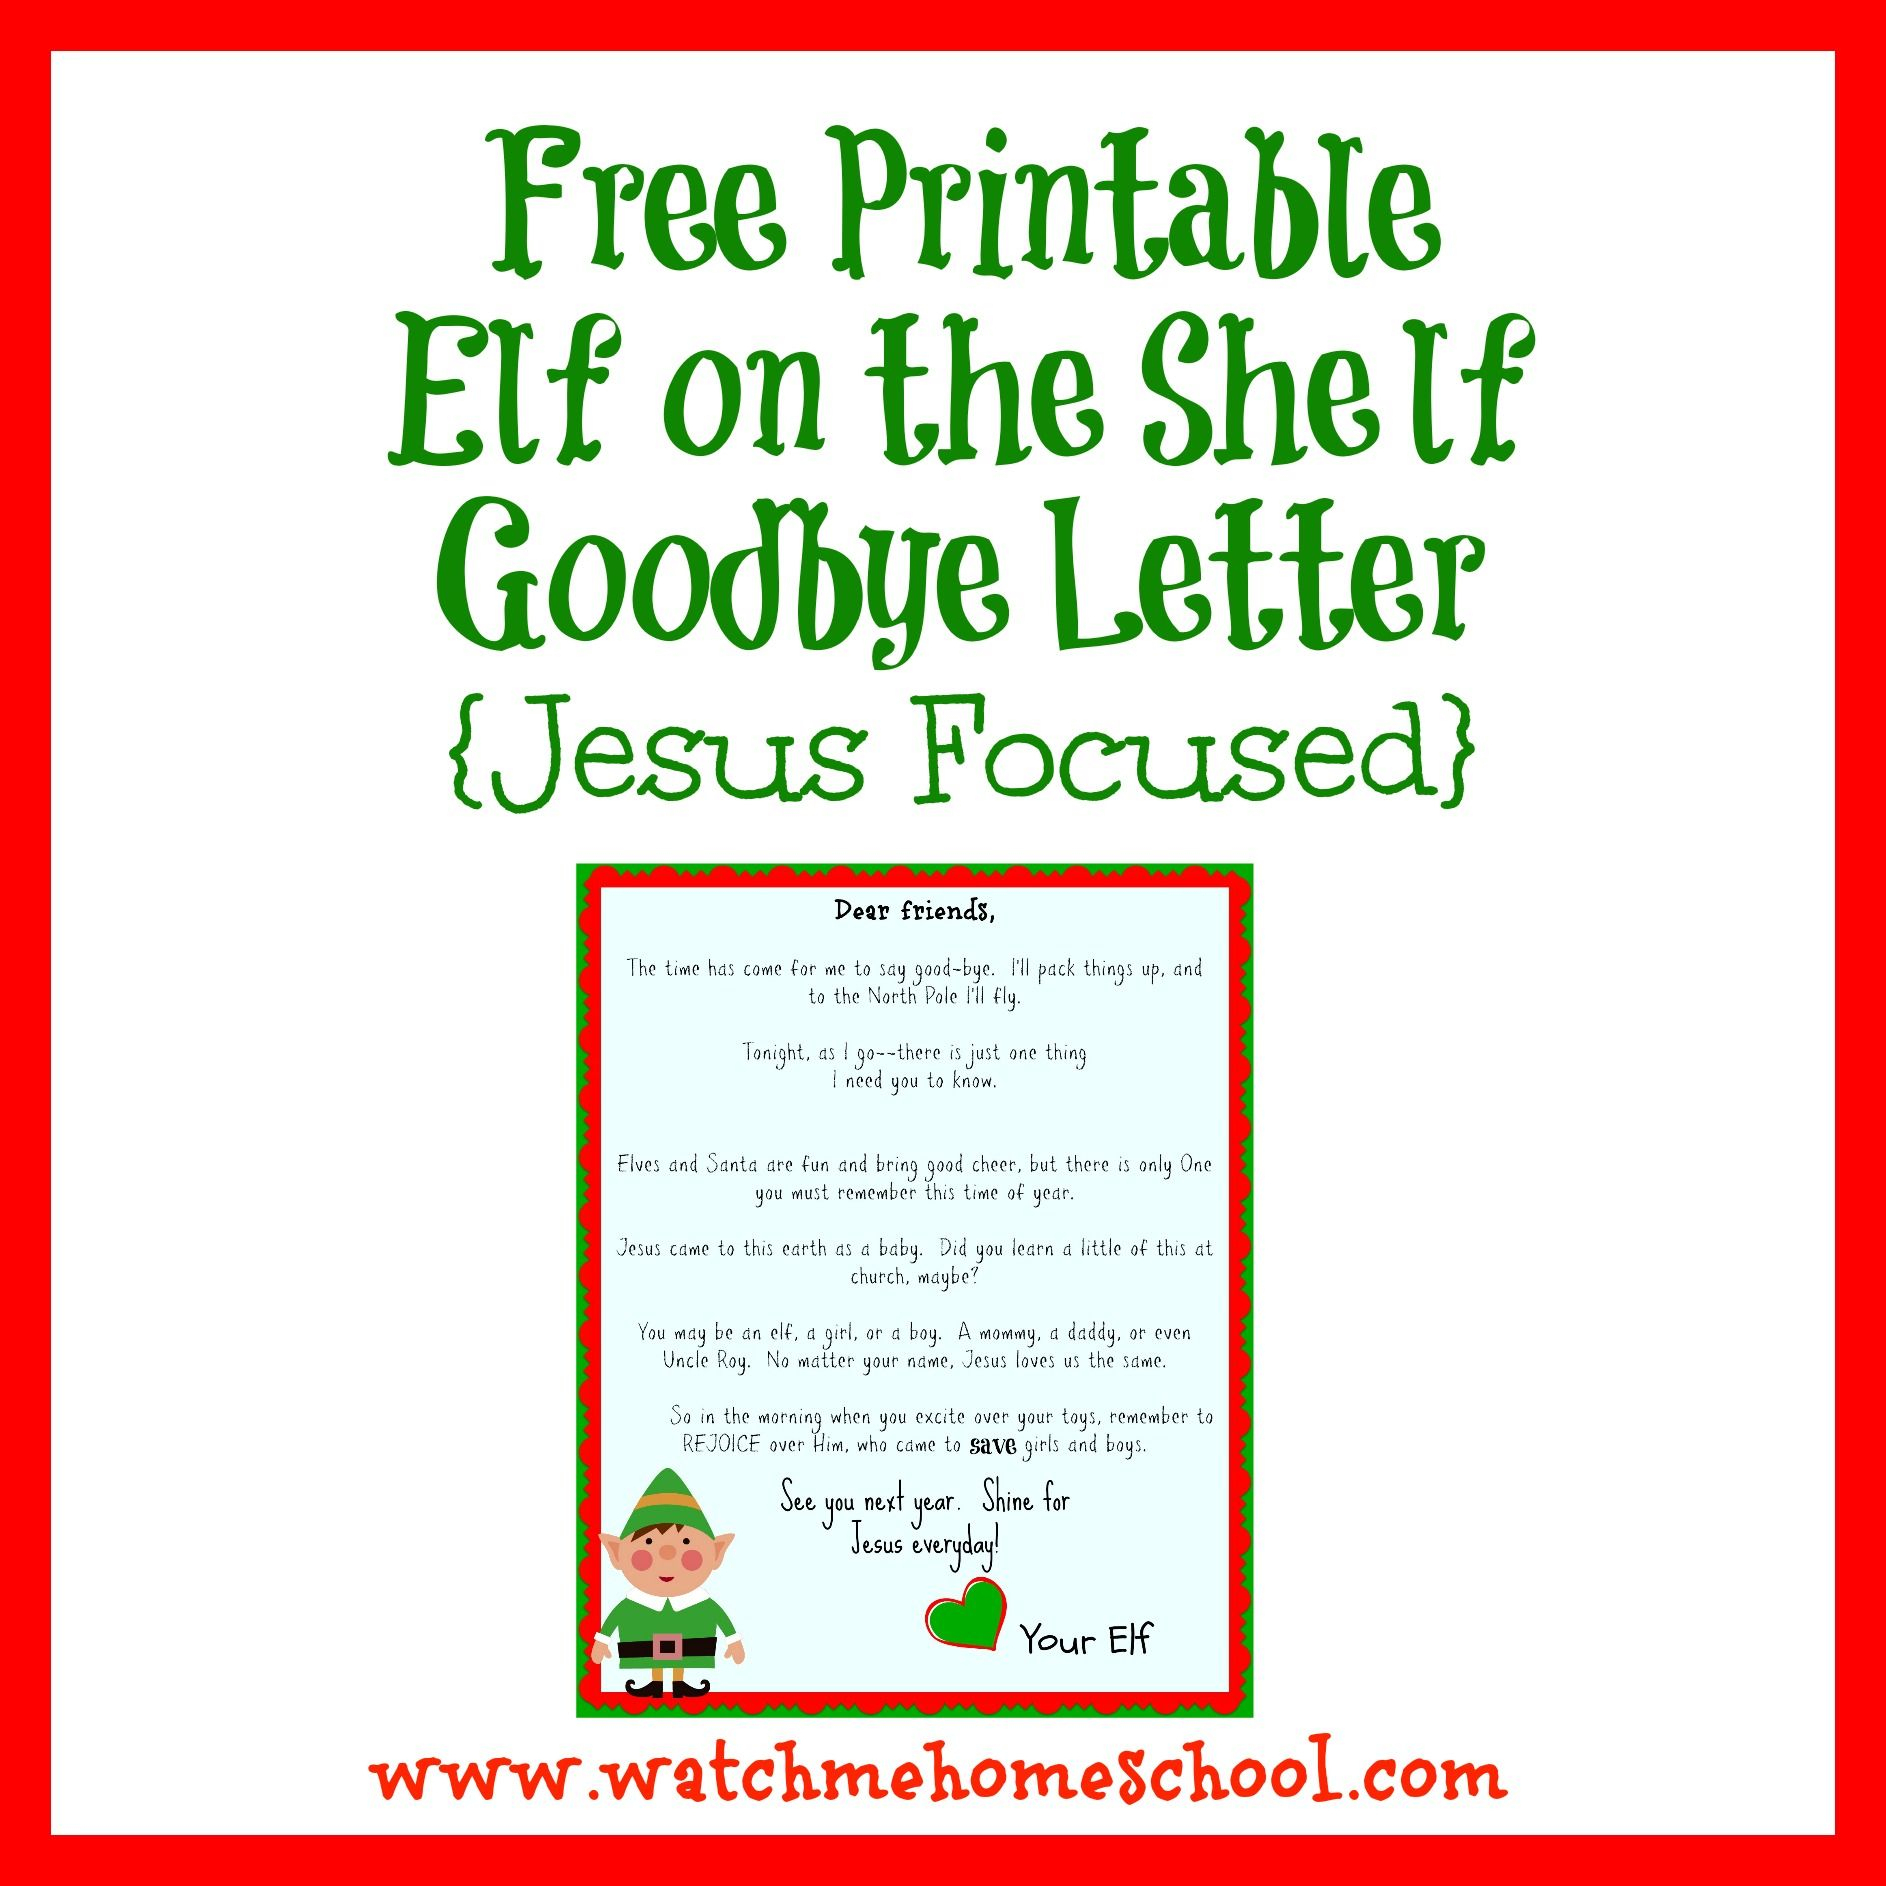 Elf On The Shelf Farewell Letter Printable | Elf On The Shelf - Elf On A Shelf Goodbye Letter Free Printable